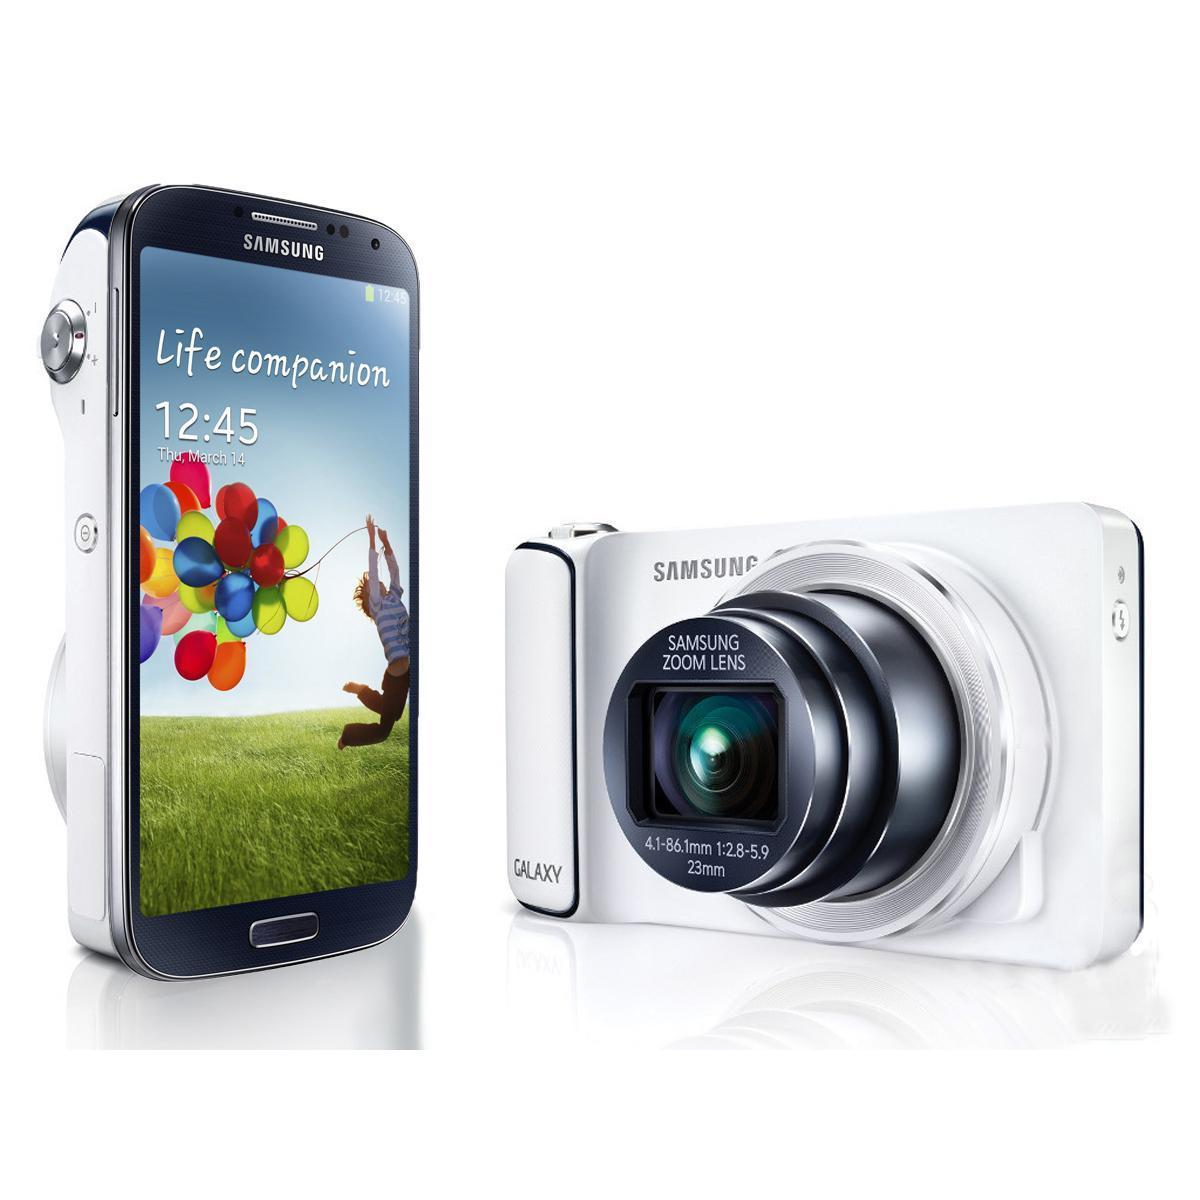 Samsung Galaxy S4 Zoom 8Go - Blanc - Débloqué